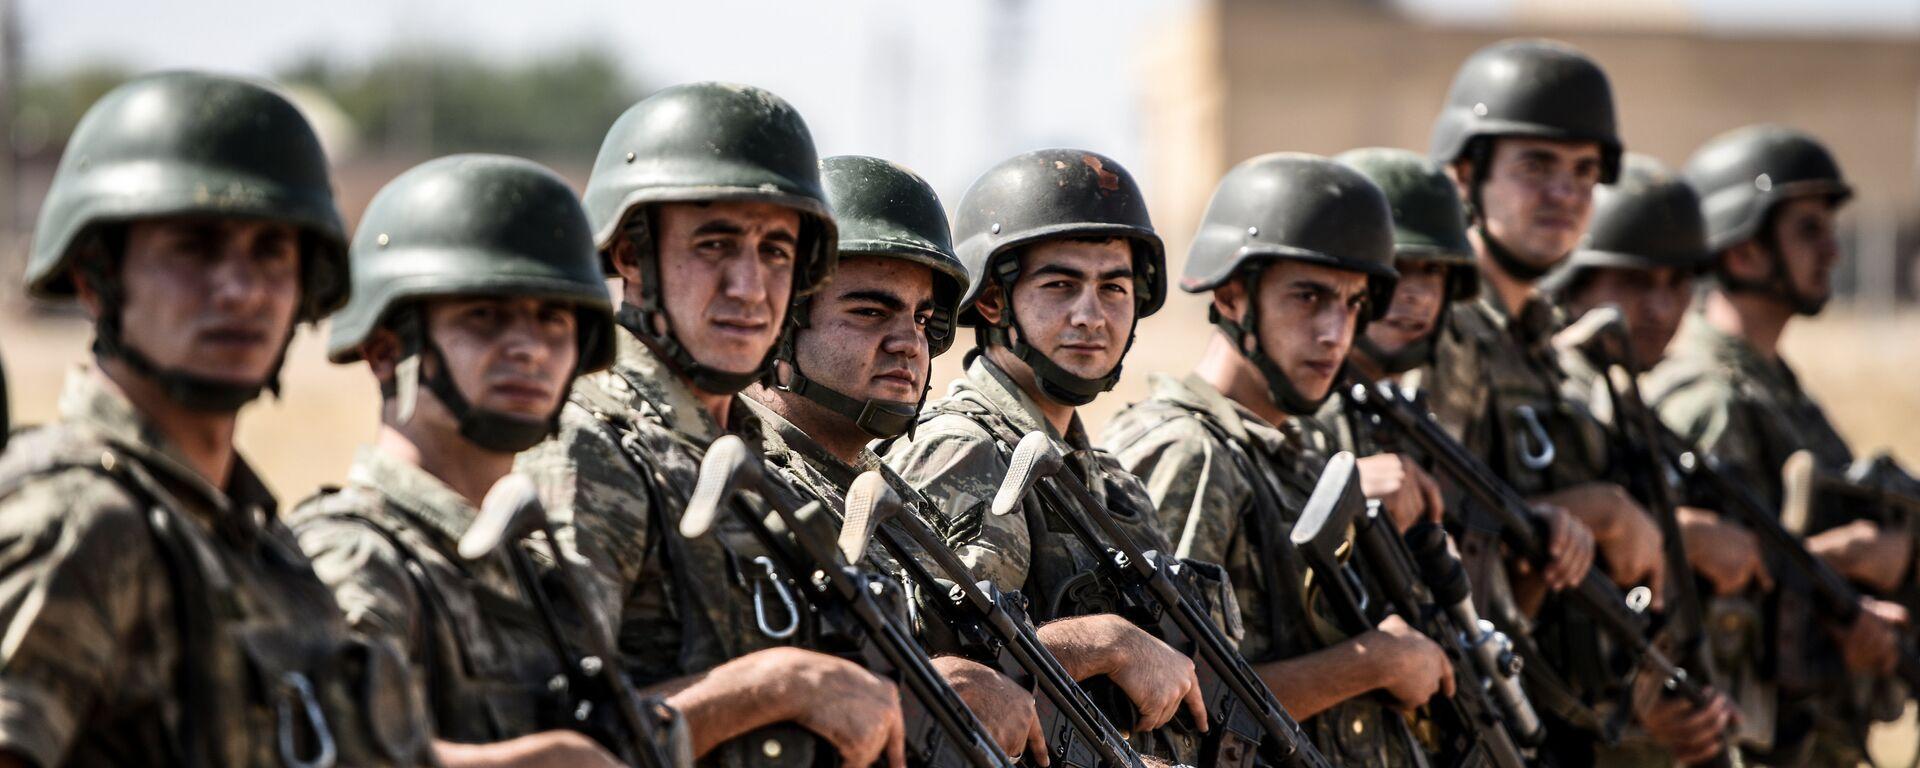 Soldati turchi - Sputnik Italia, 1920, 04.07.2021